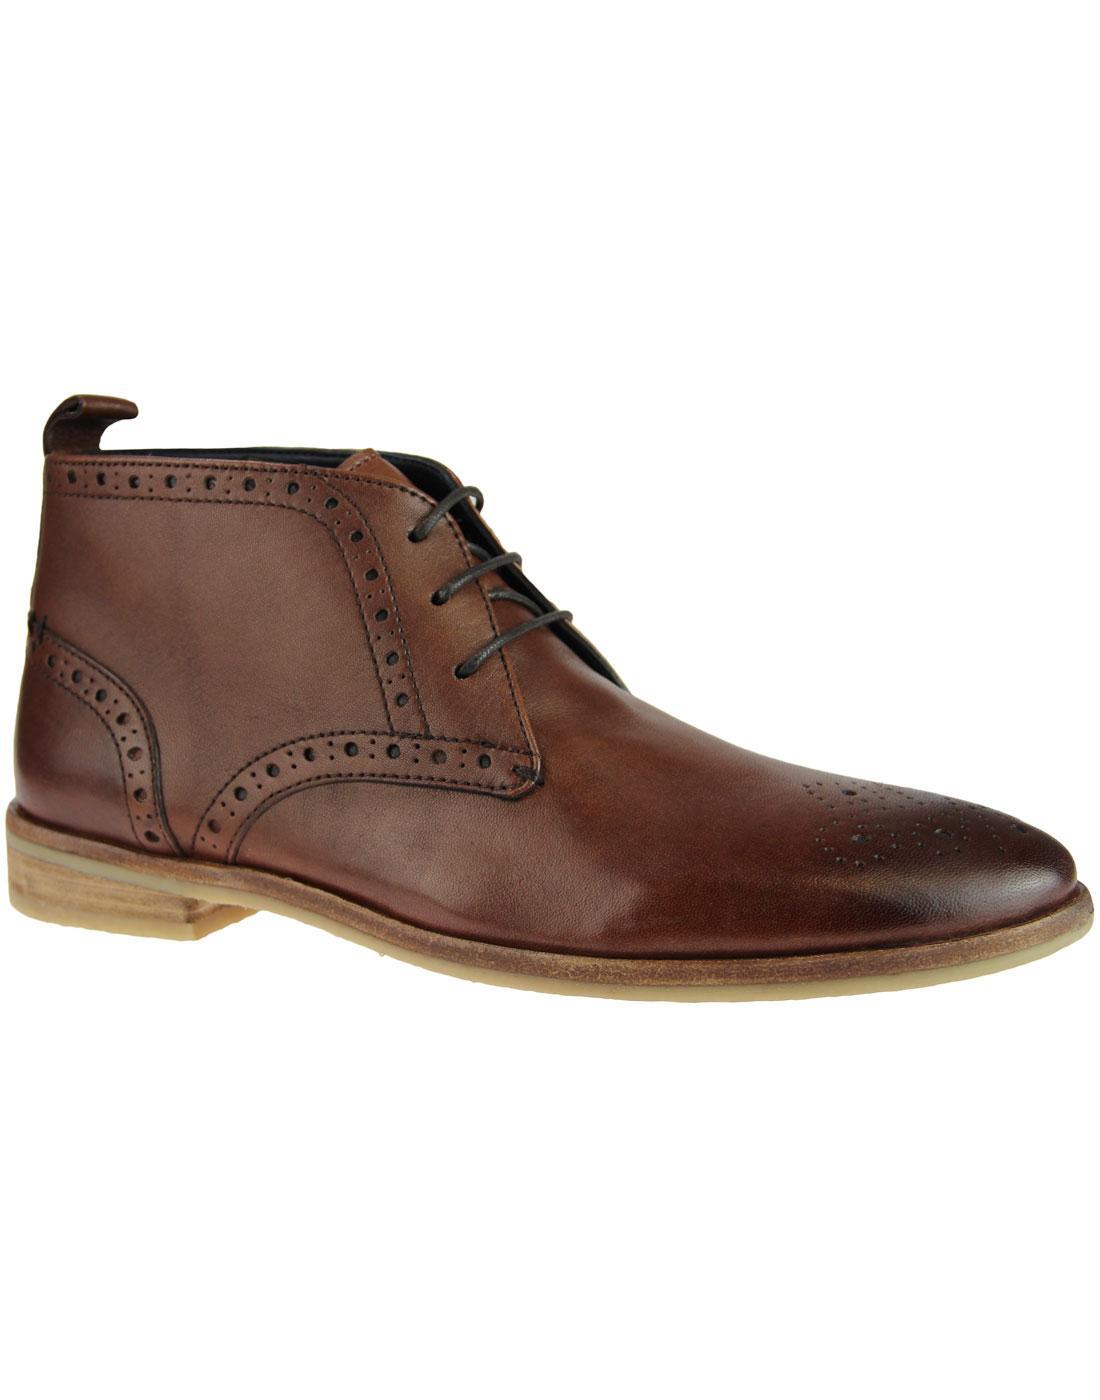 PAOLO VANDINI Tavis Retro Mod Brogue Ankle Boots